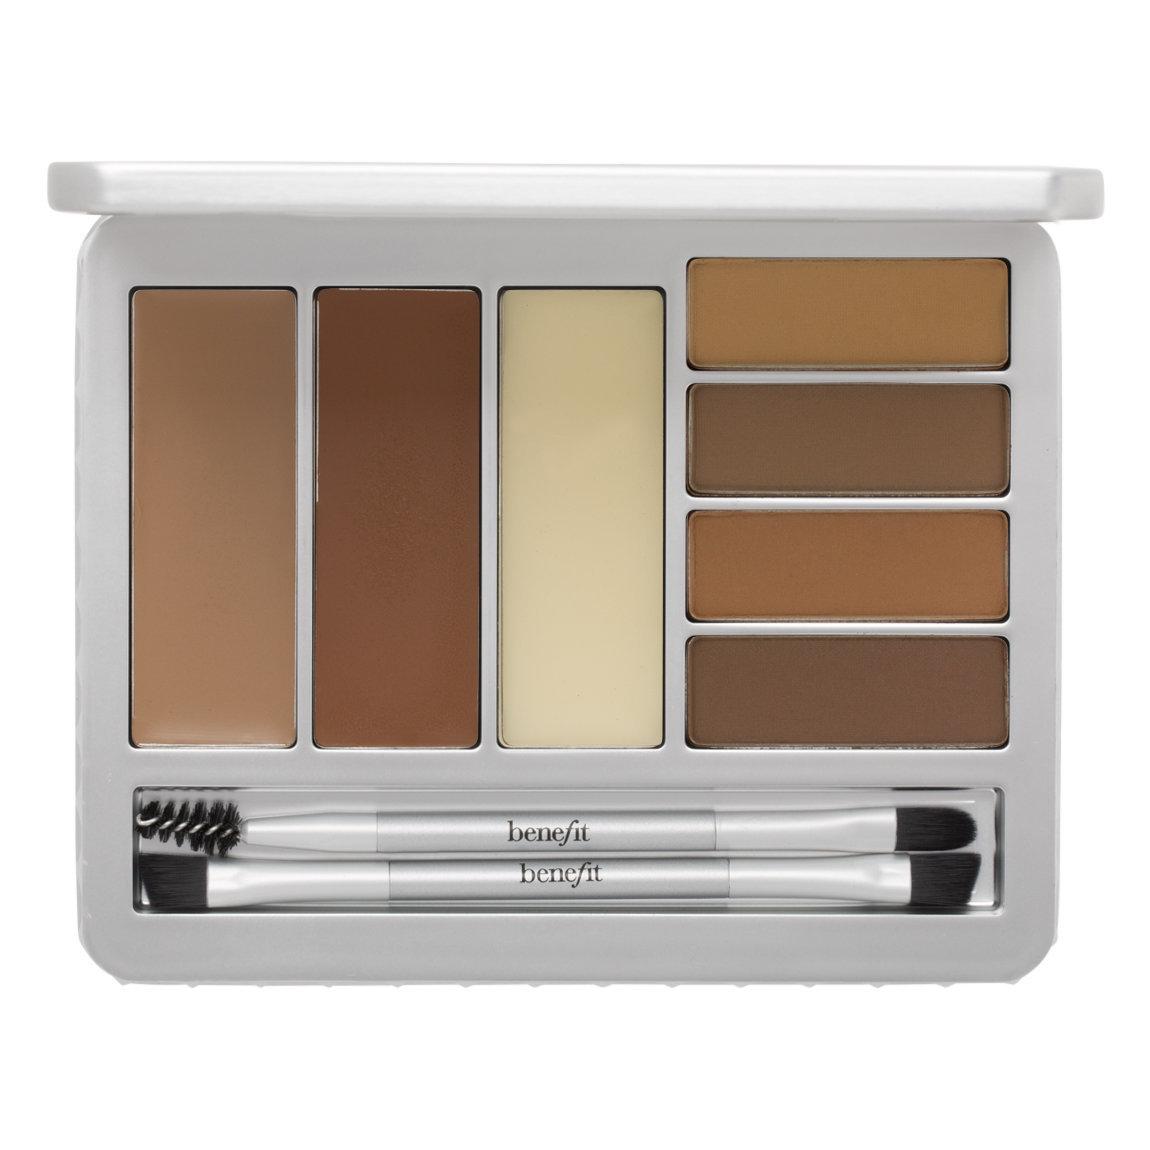 Benefit Cosmetics Brow Zings Pro Palette Light-Medium product swatch.